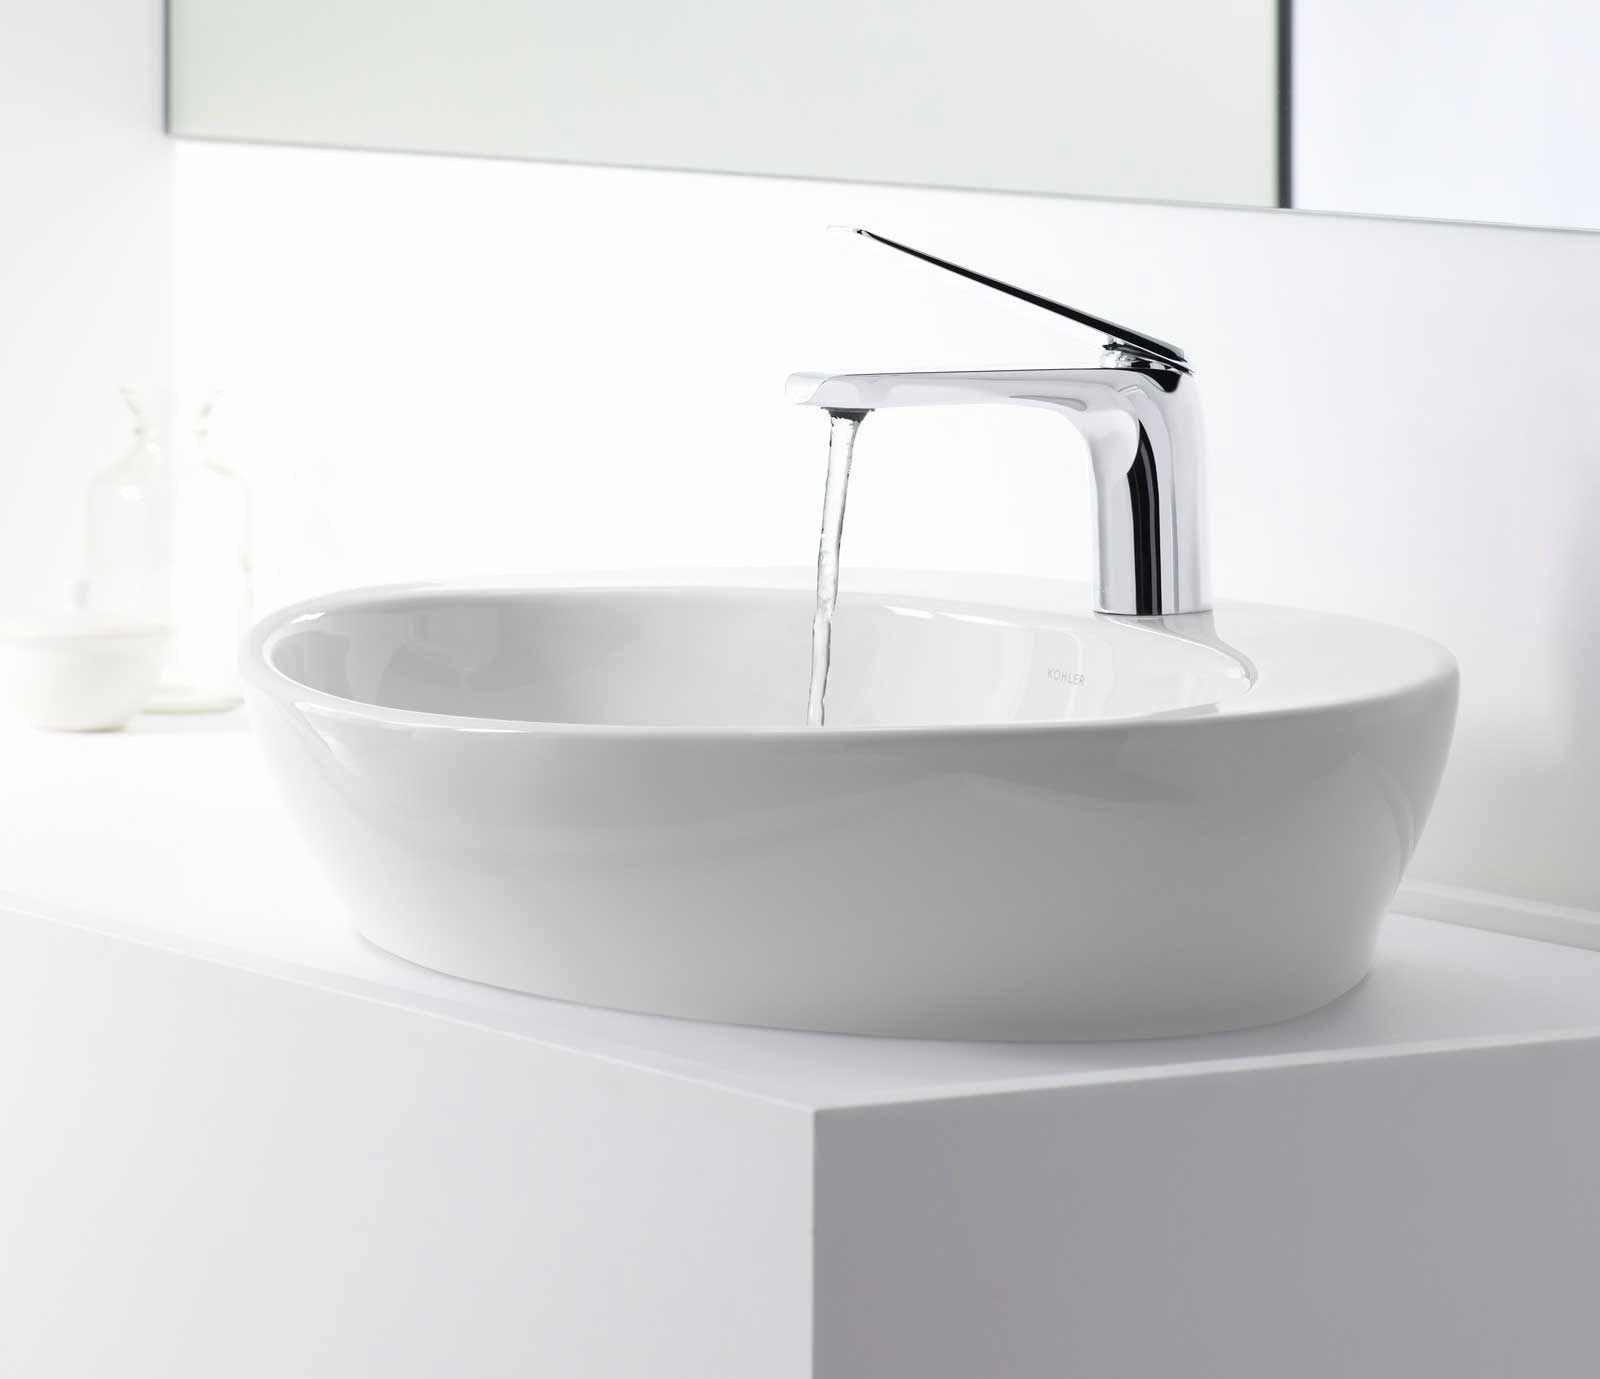 Kohler Corner Sink Elegant Bathroom Kohler Bathroom Sinks Elegant Bathroom Kohler Bathroom Sink Sink